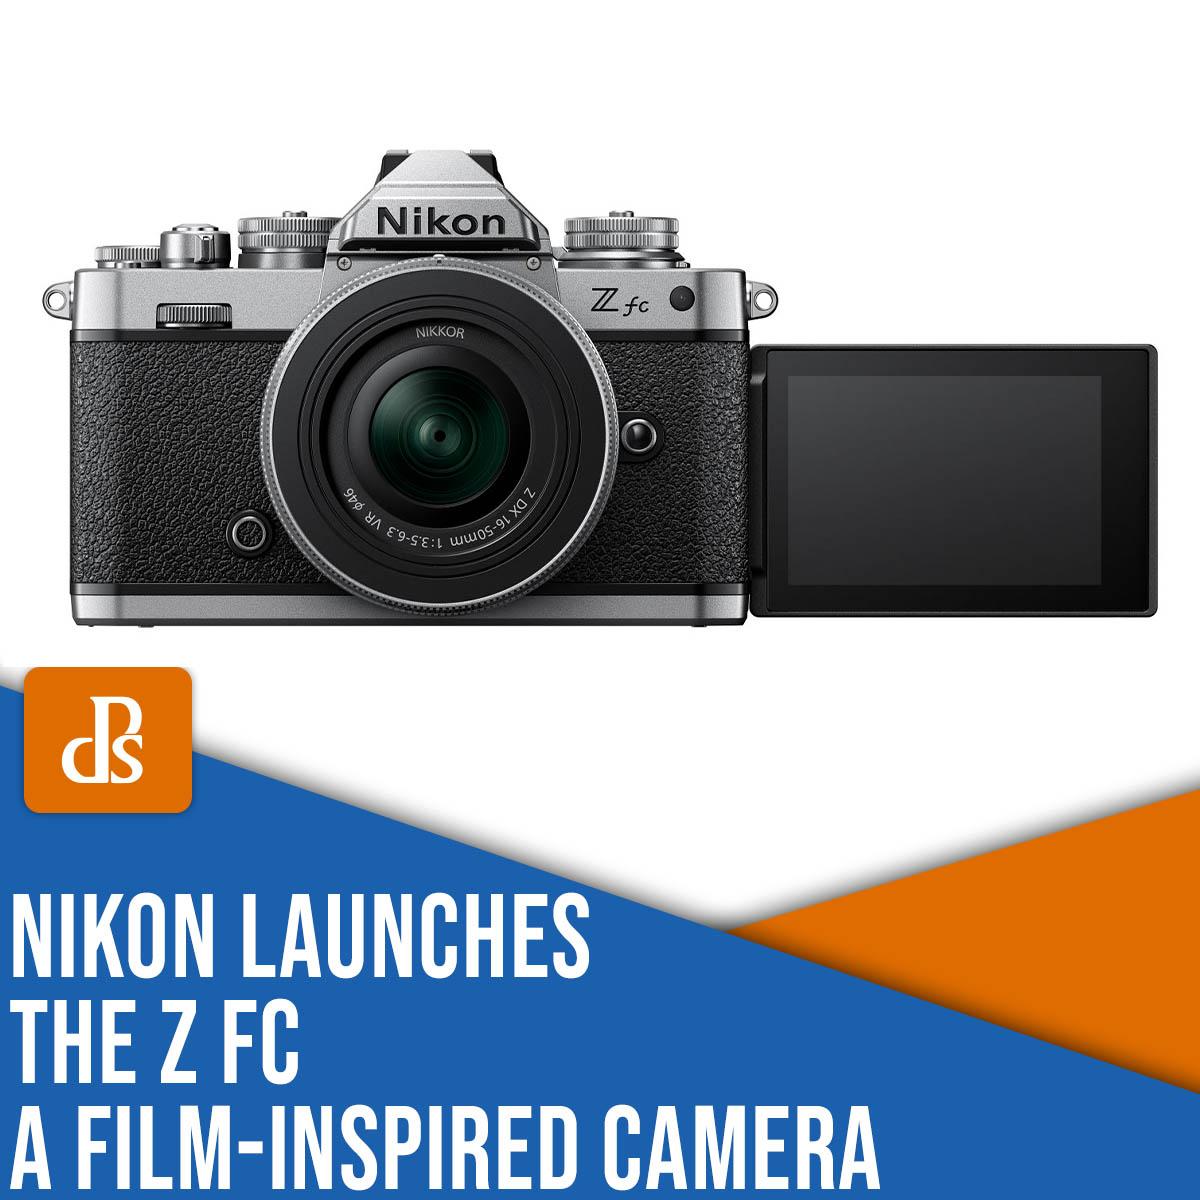 Nikon launches the Z fc